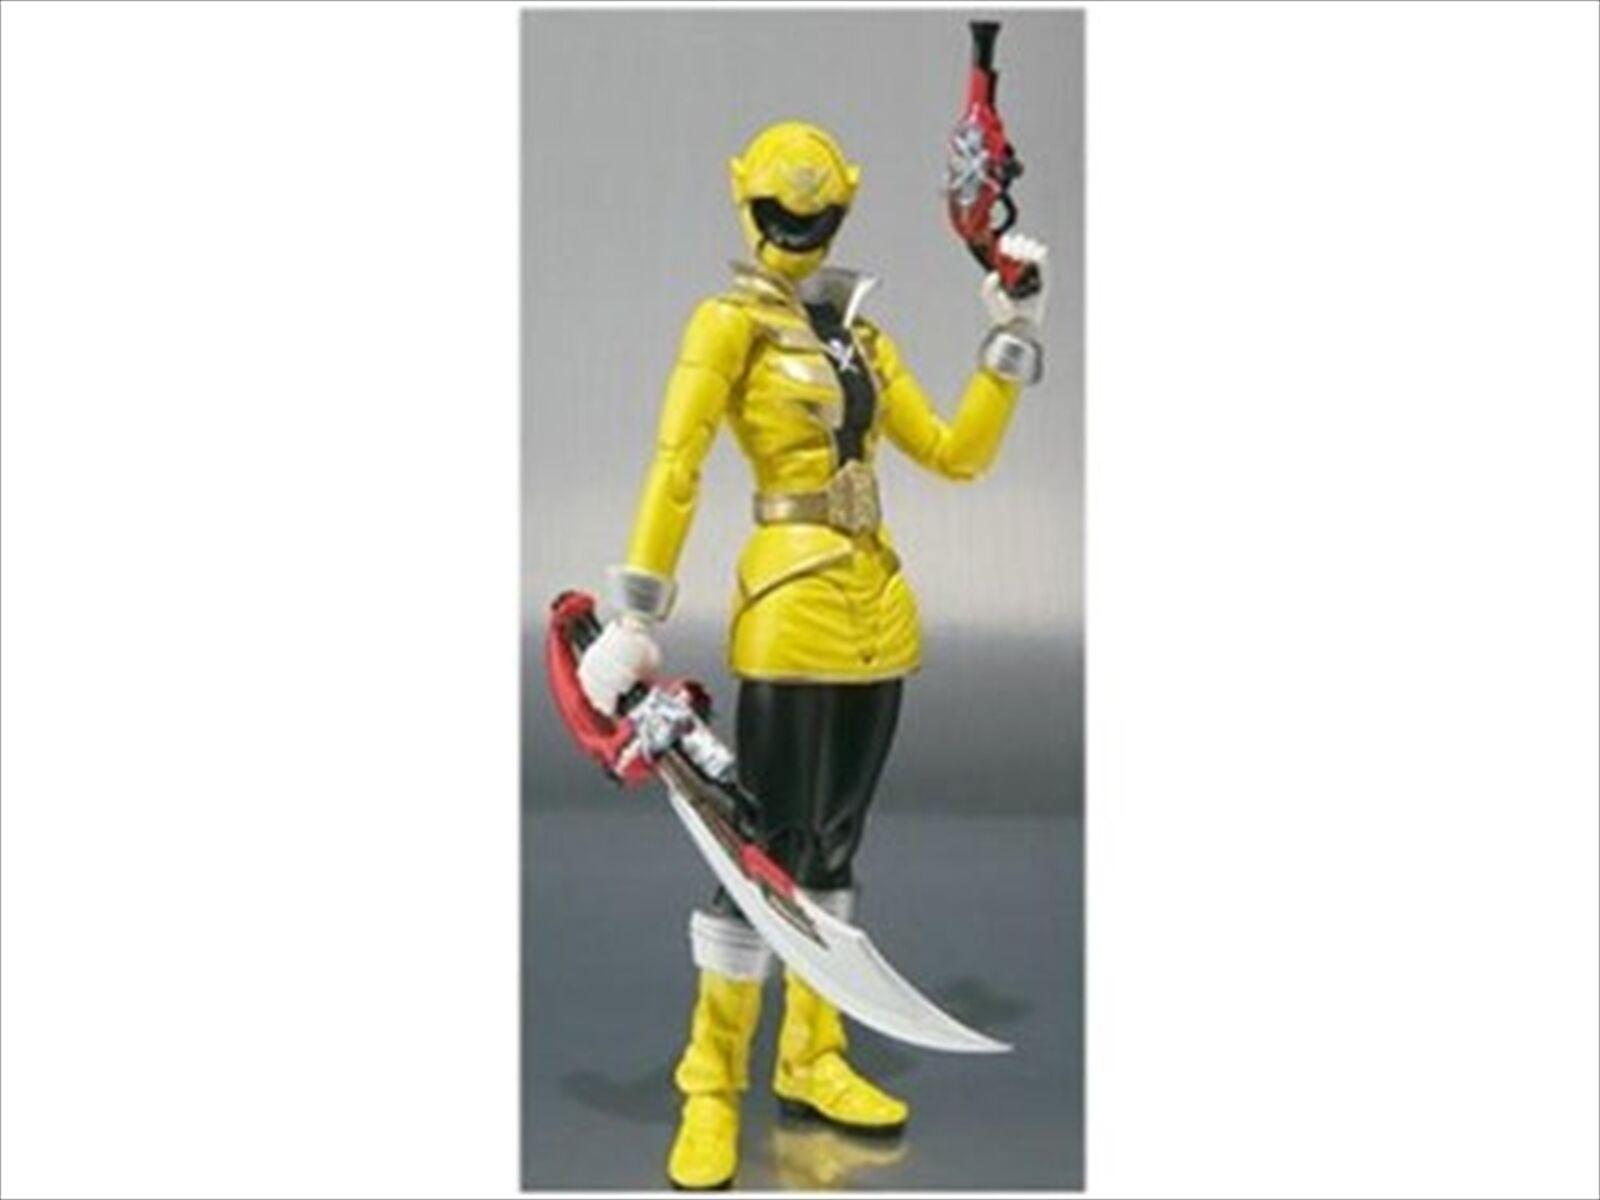 Bandai S.H. Figuarts Figuarts Figuarts Kaizoku Sentai Gokaiger Gokai Yellow Action Figure 7b0ed2